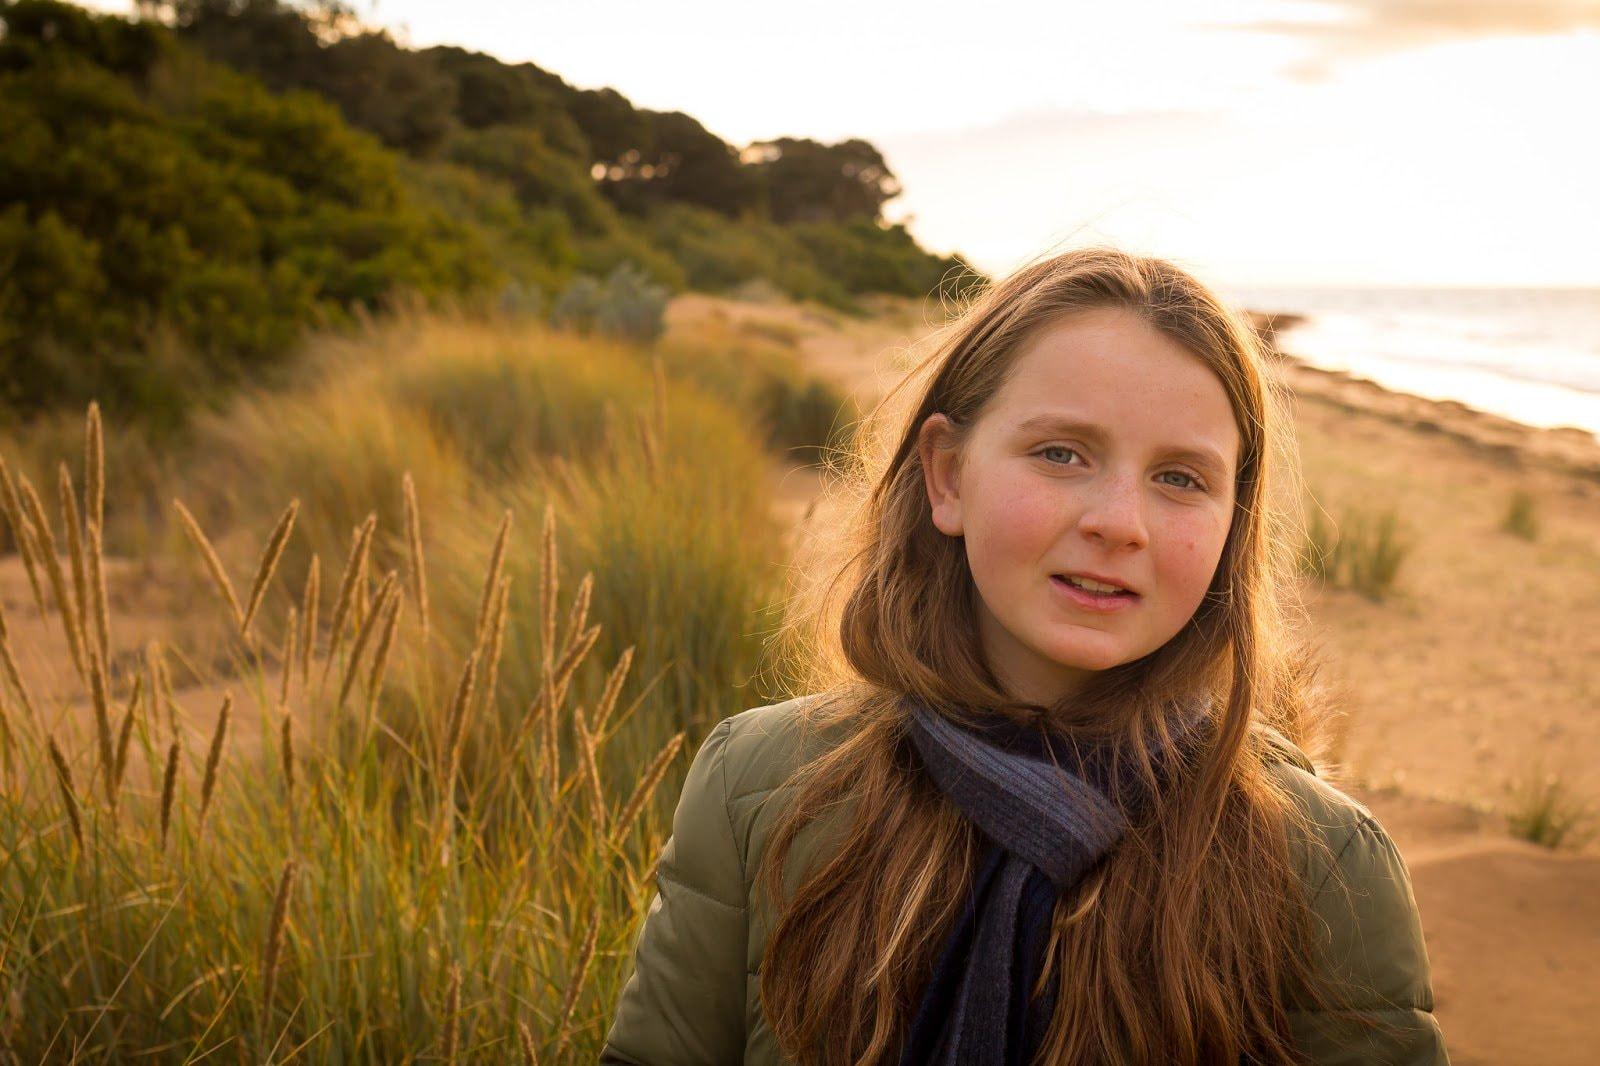 Portrait of a girl against a coastline by Cohen Van der Velde